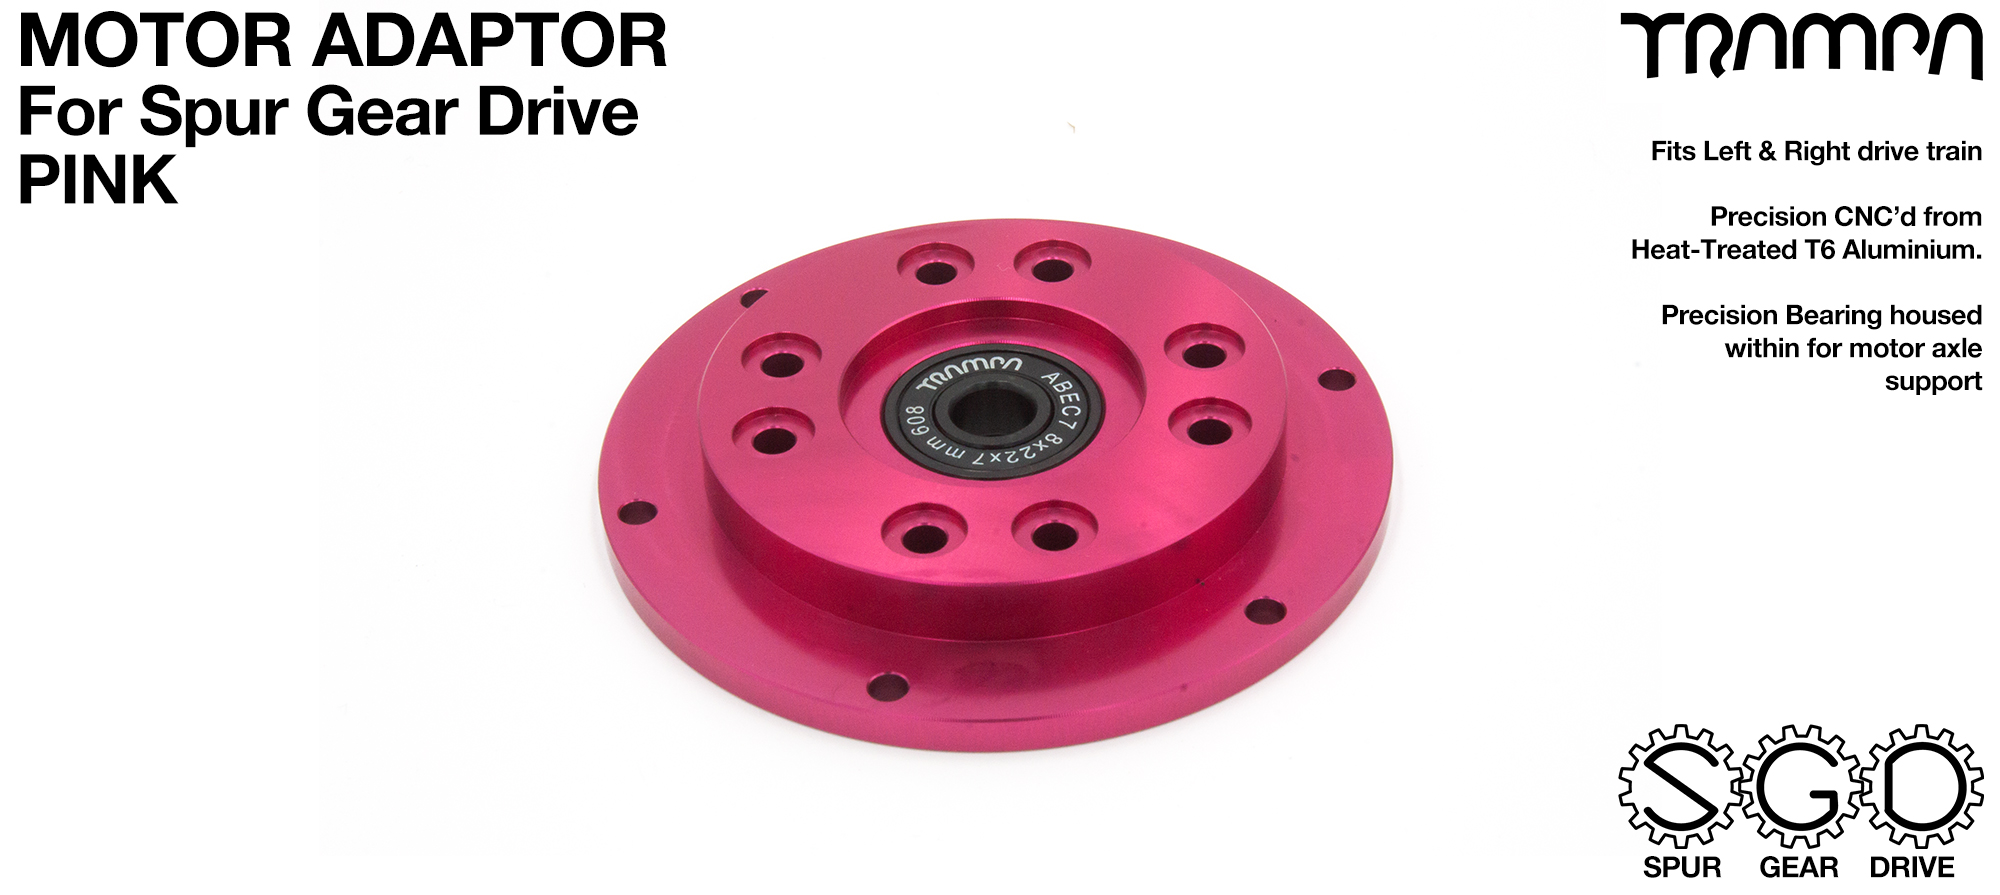 MkII Spur Gear Drive Motor Adaptor PINK